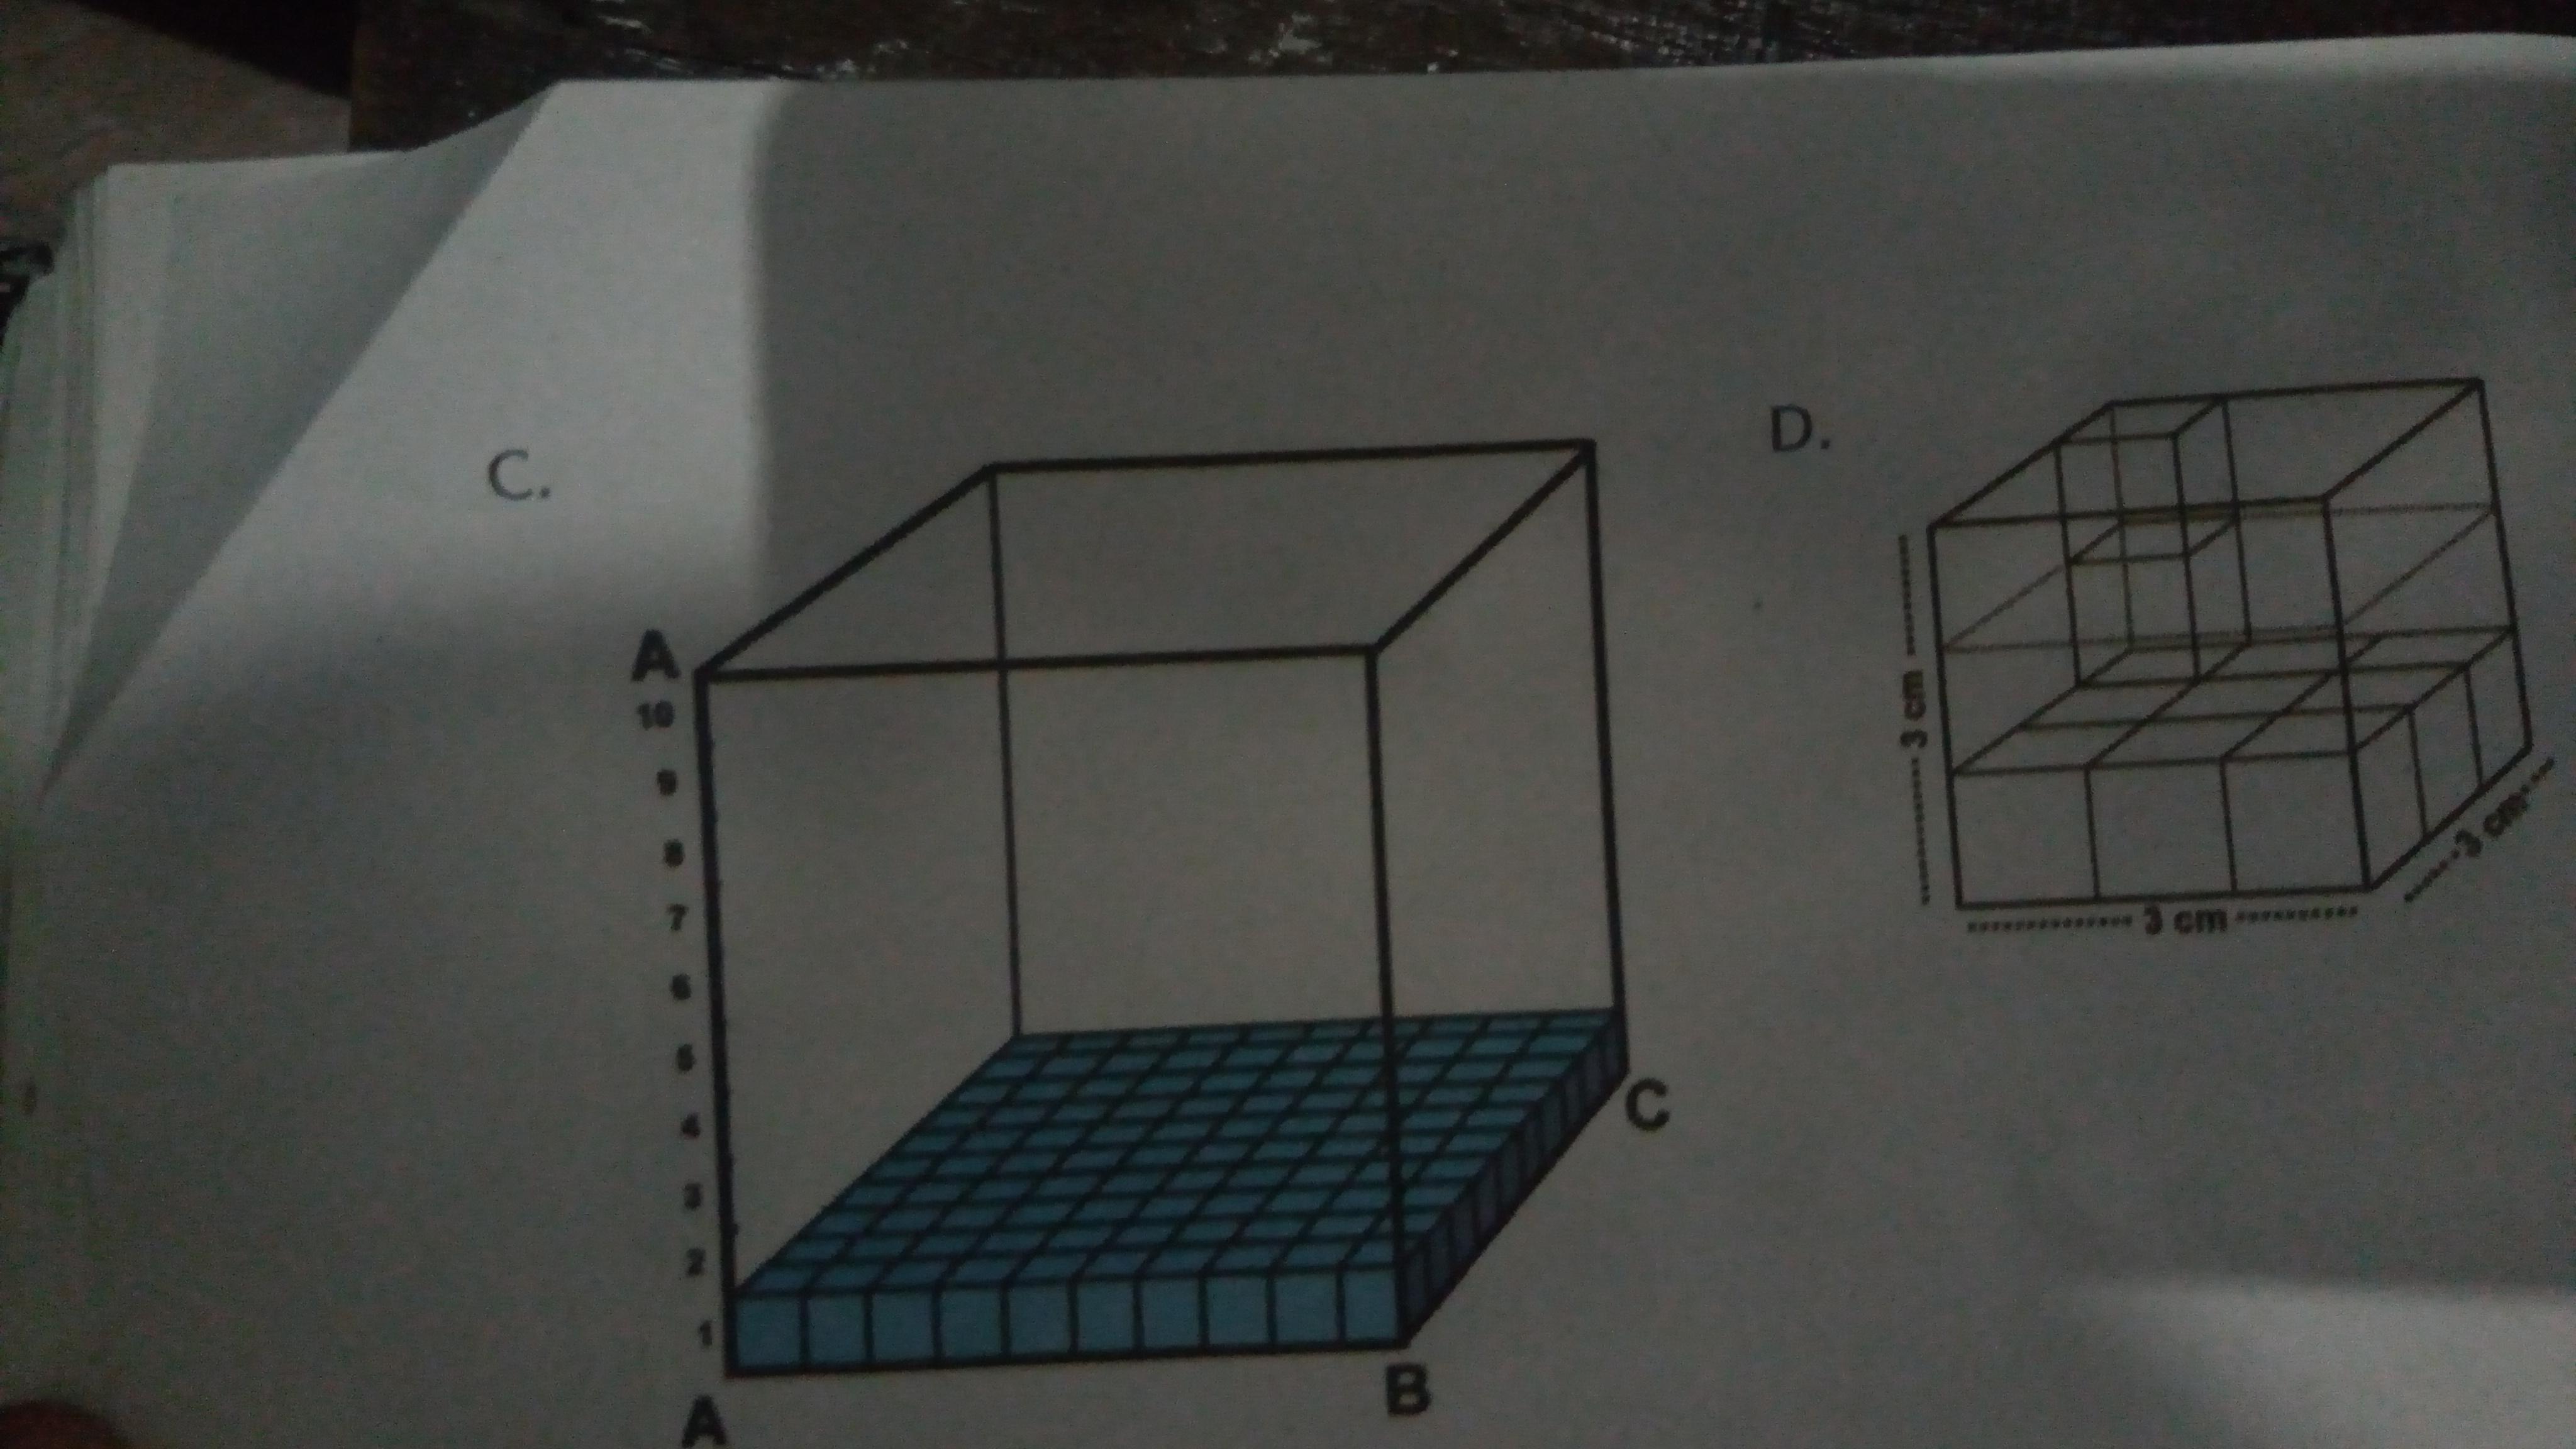 Hitunglah volume kubus pada gambar berikut! - Brainly.co.id